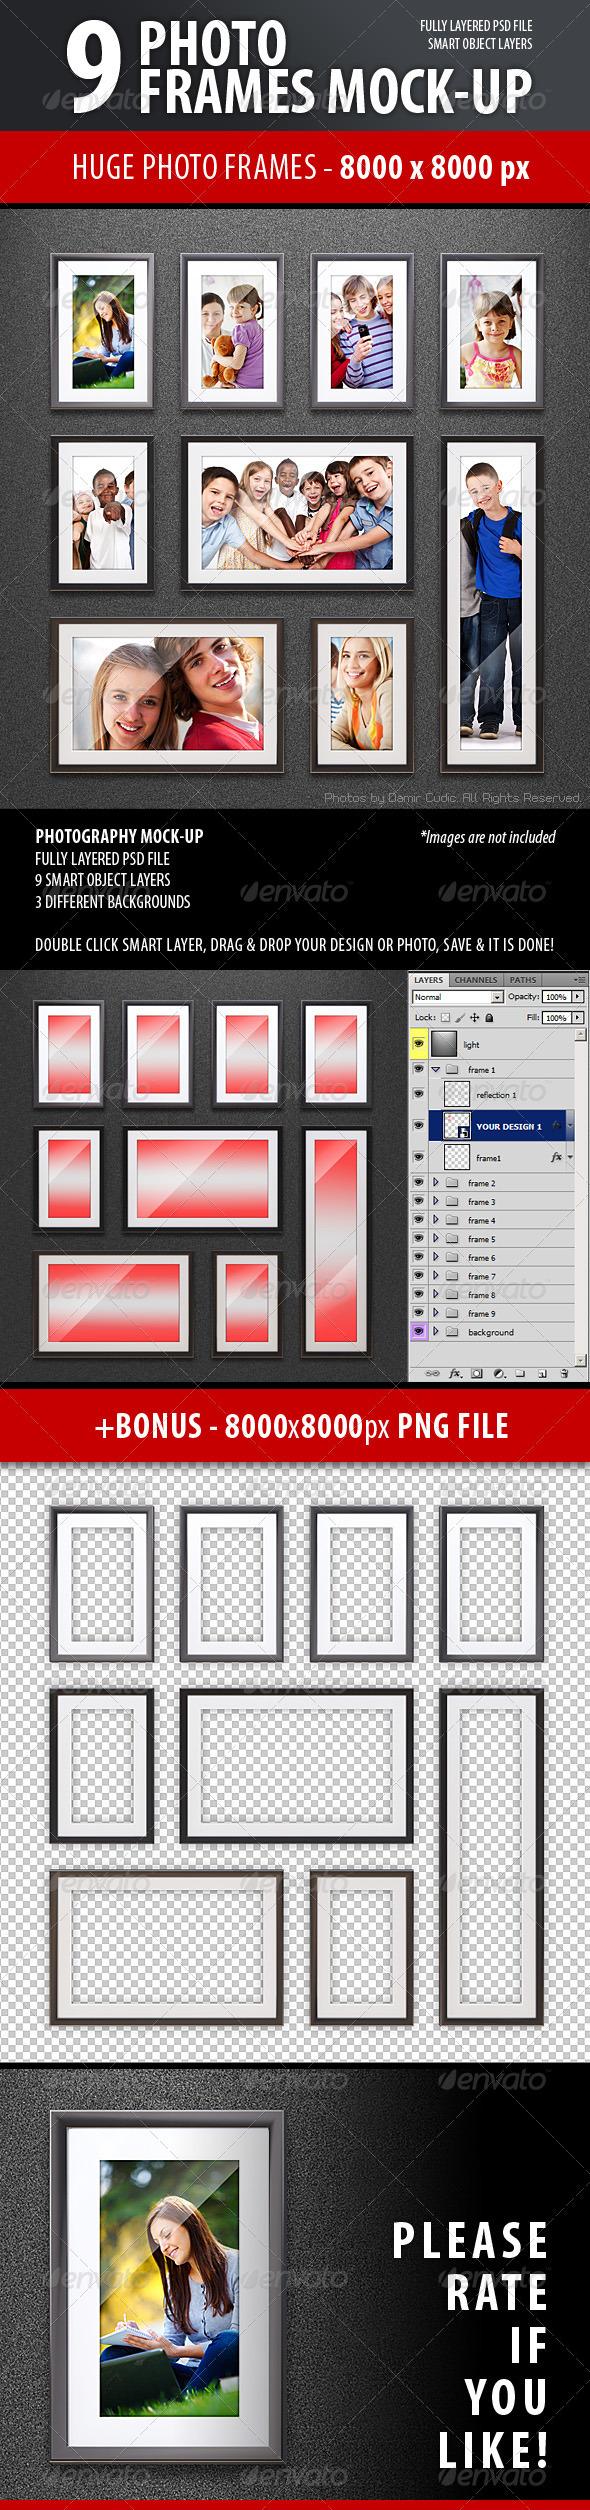 GraphicRiver Photo Frames Mock-up 3716180